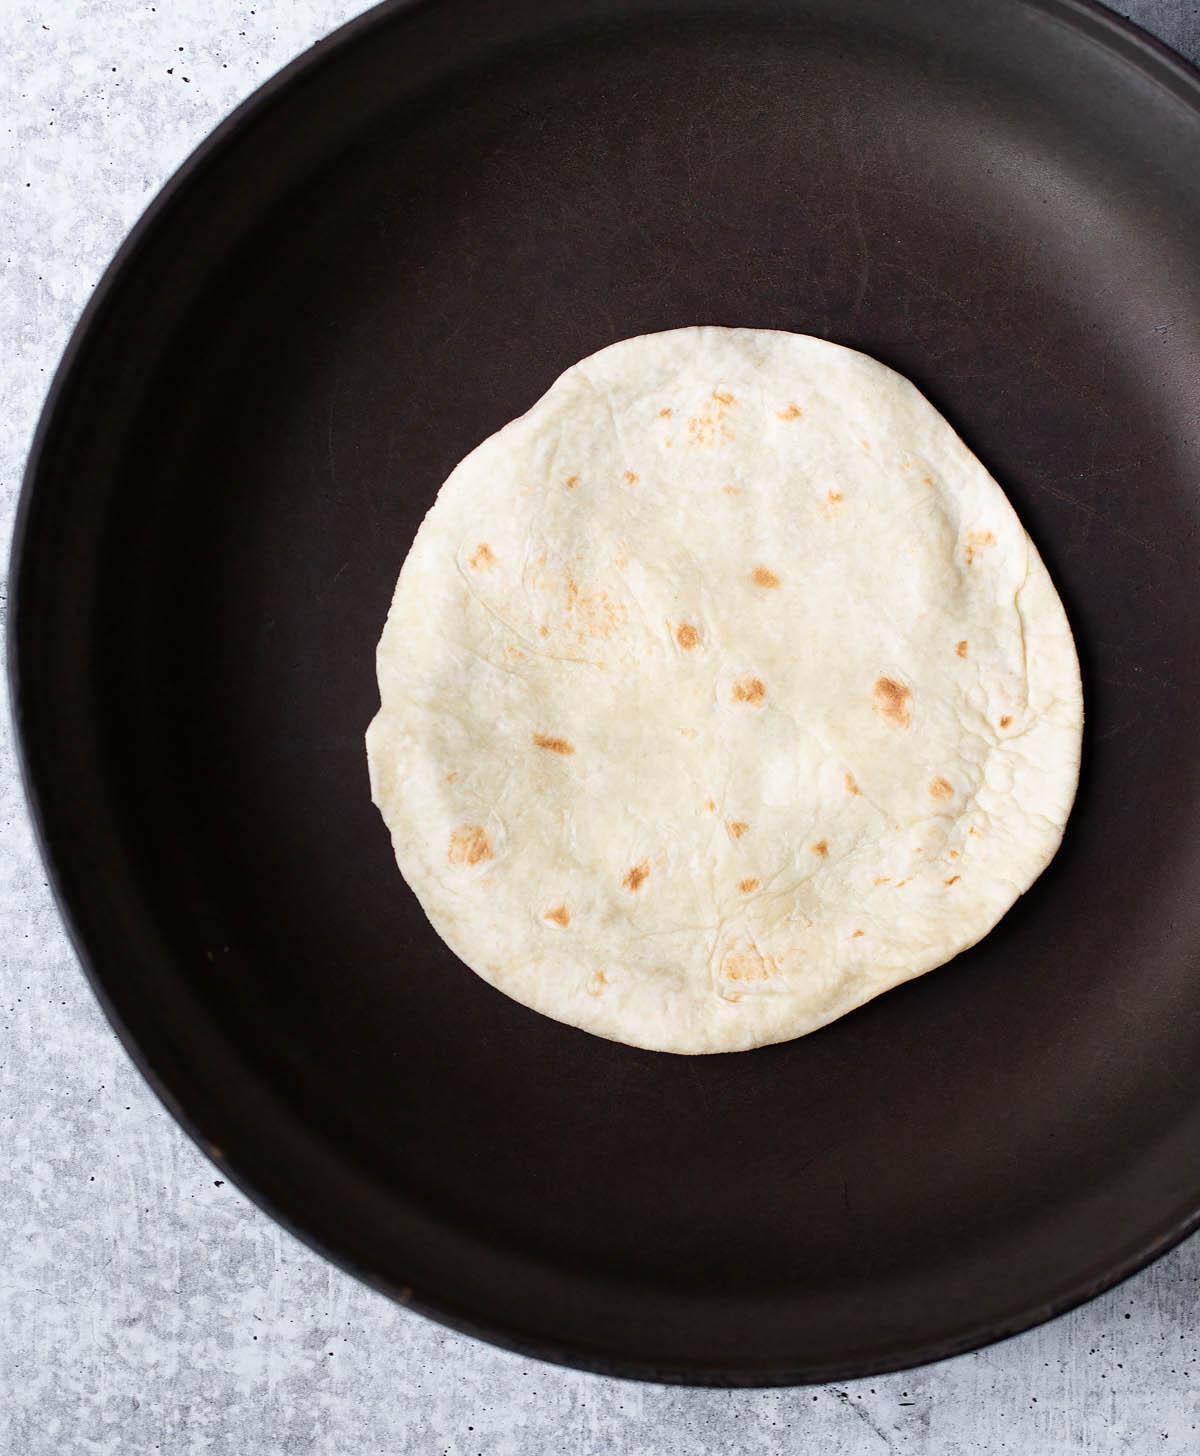 tortilla in a frying pan